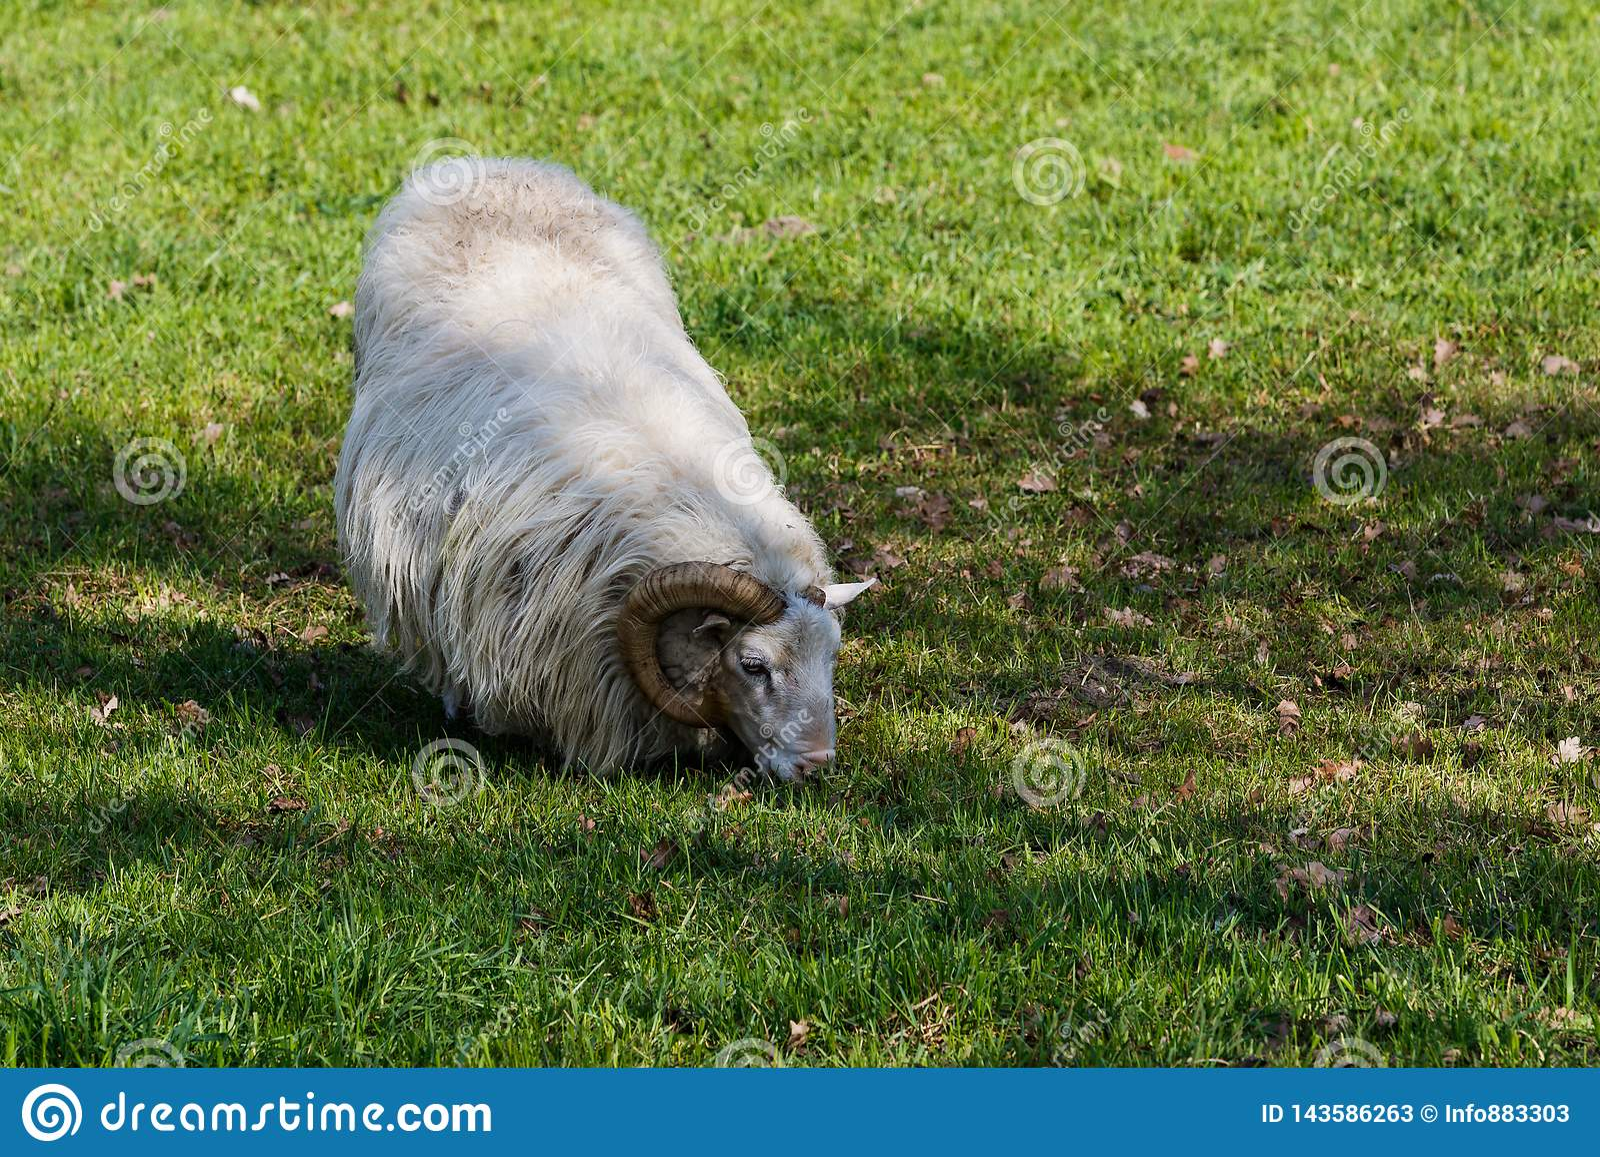 Sheep feeding on a green pasture